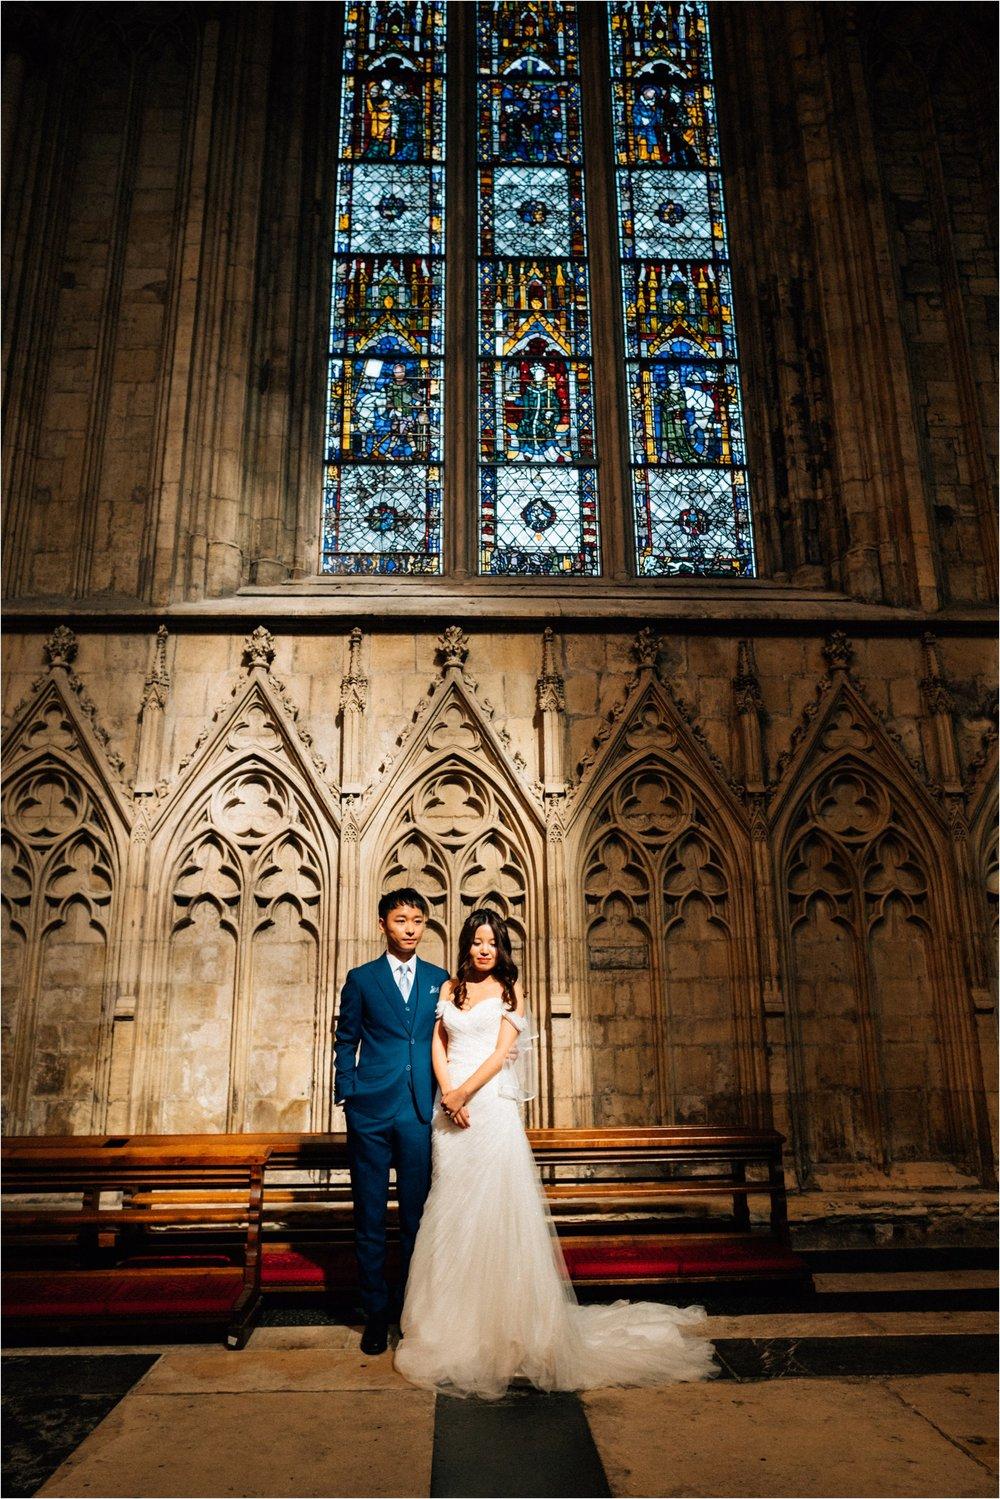 York city elopement wedding photographer_0145.jpg